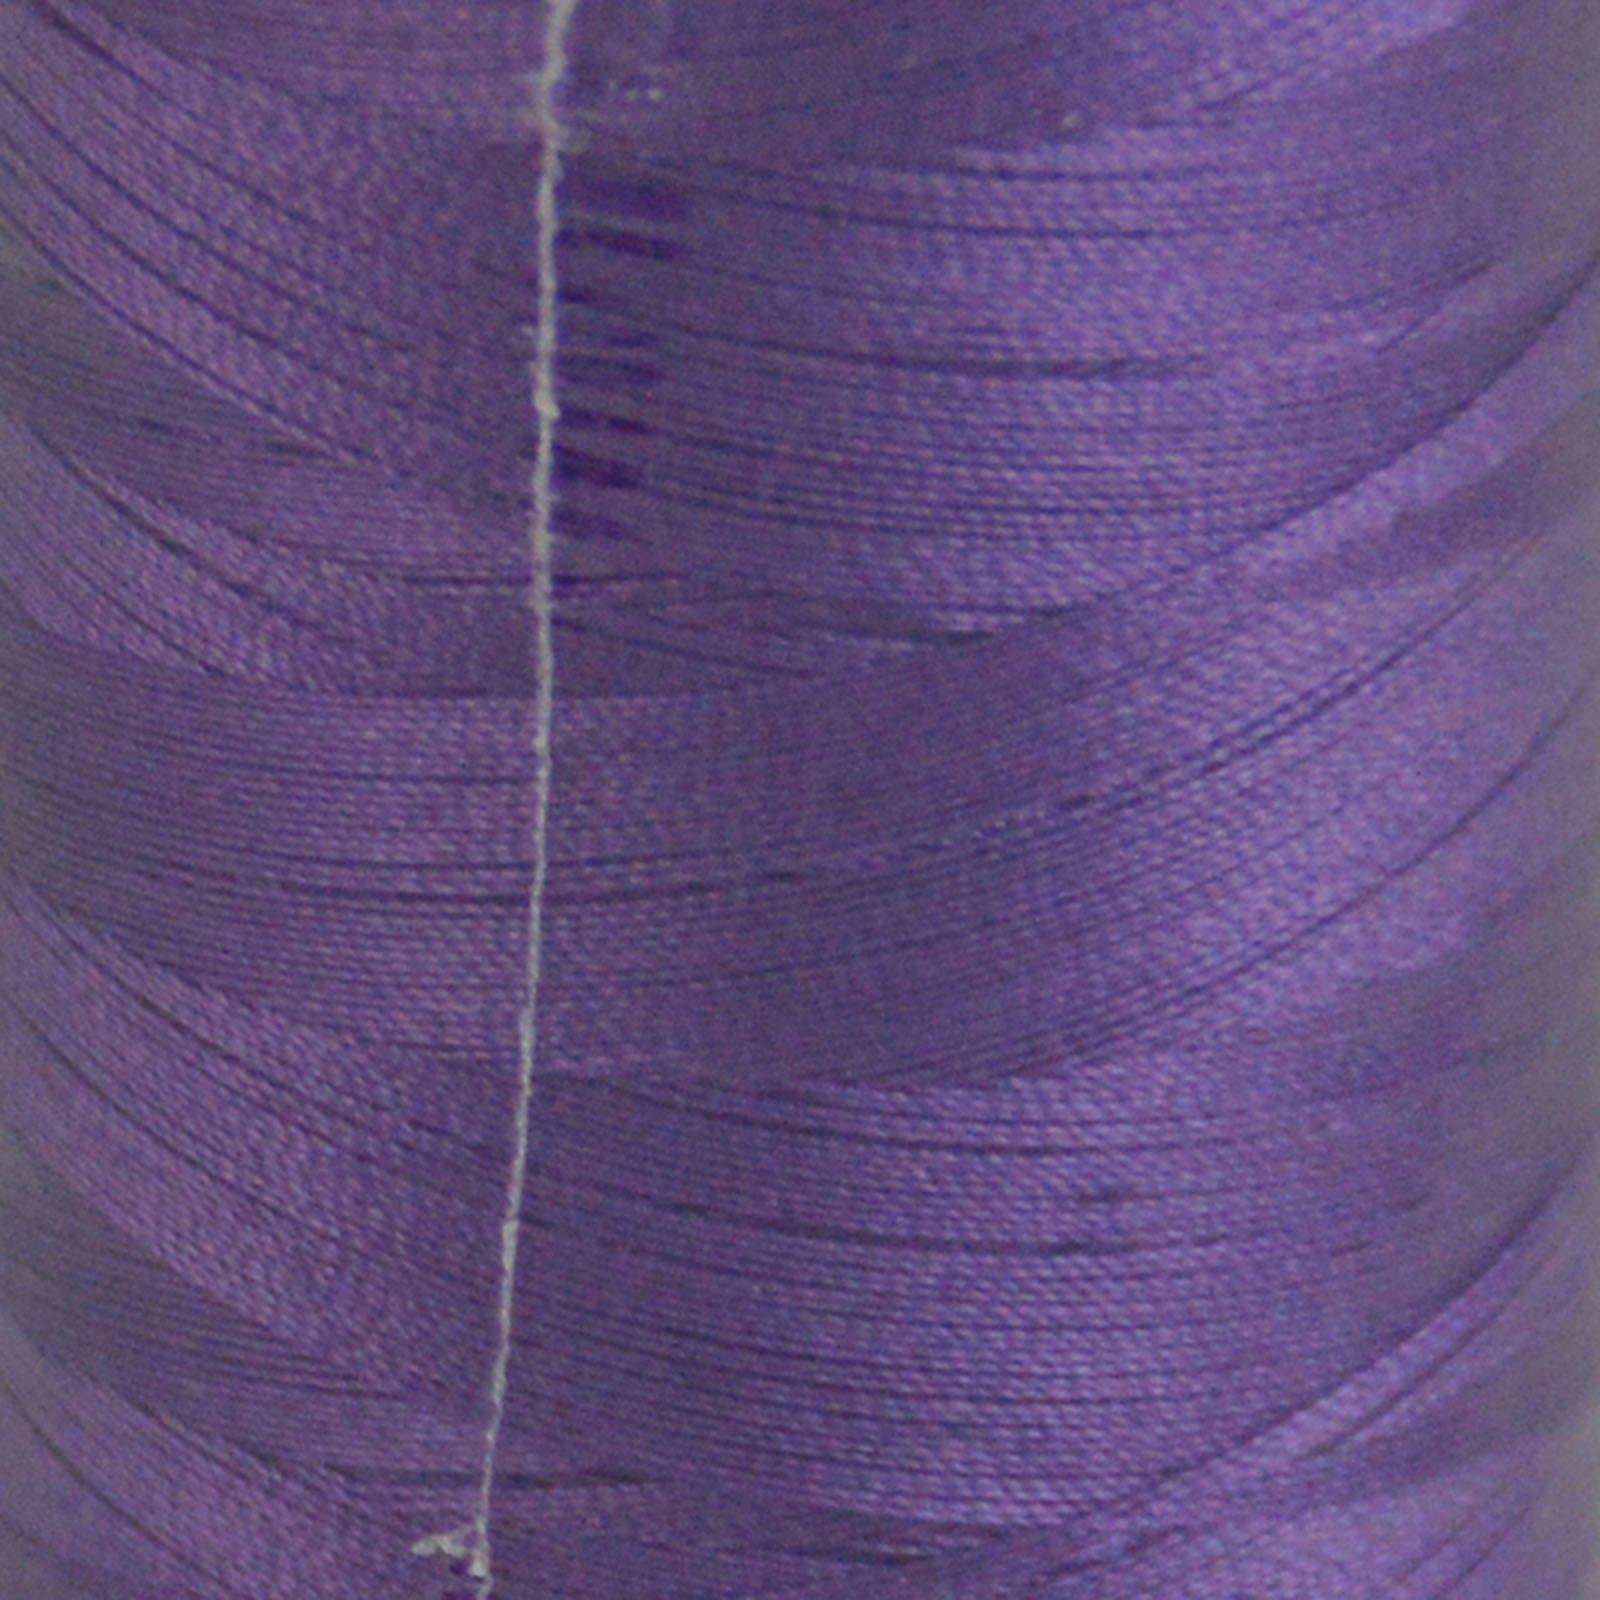 # 1243 Dusty Lavender